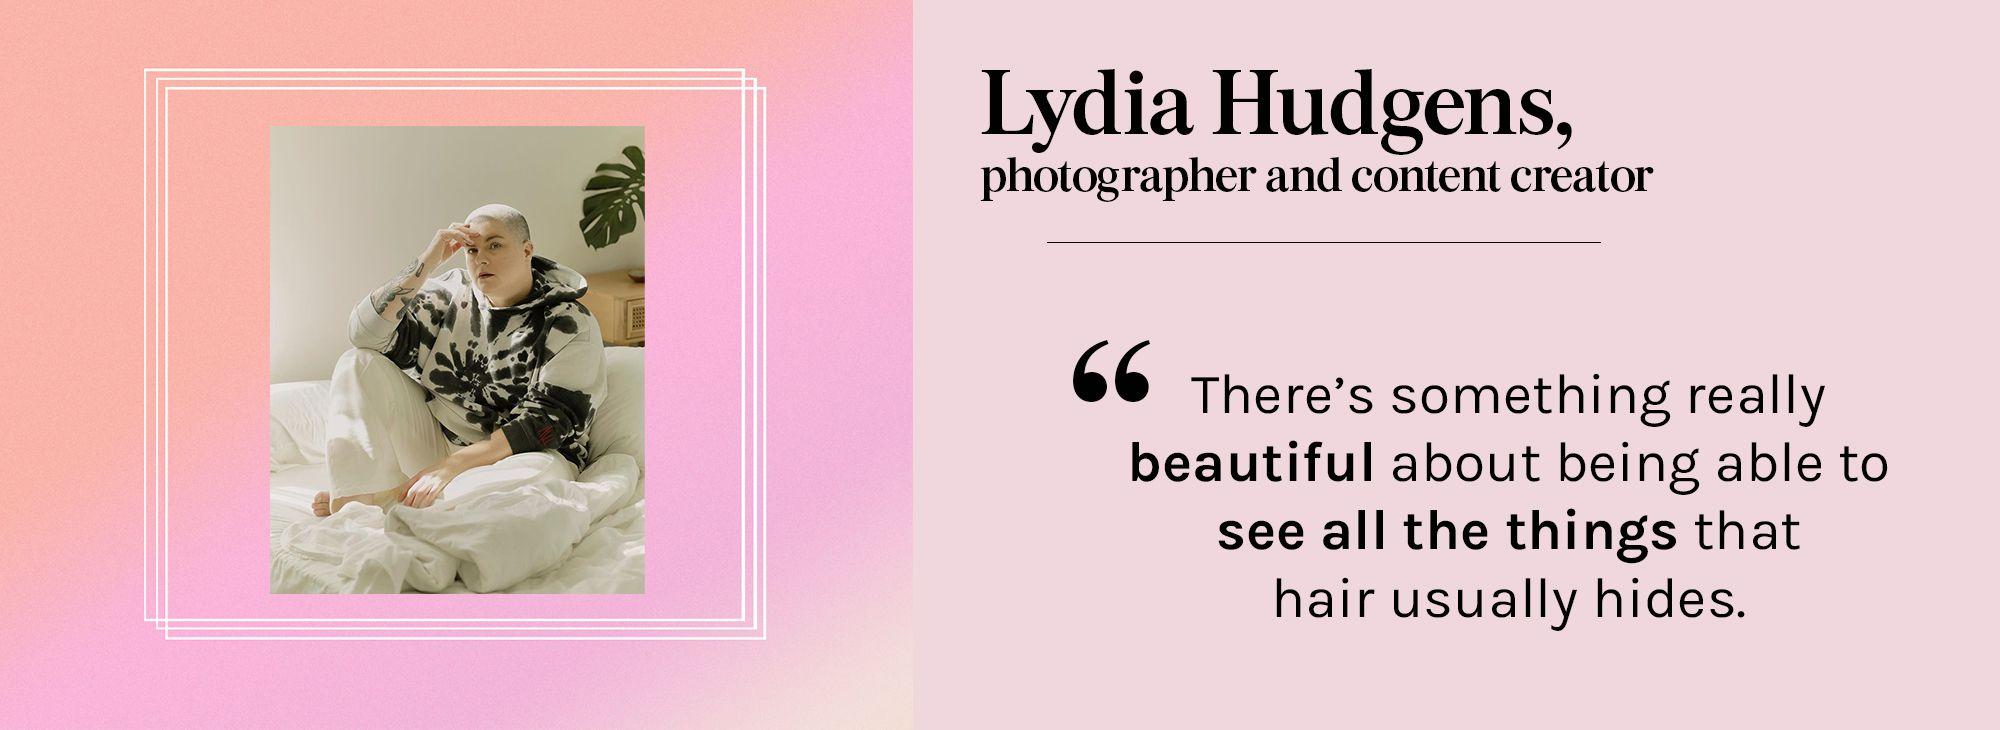 Lydia Hudgens